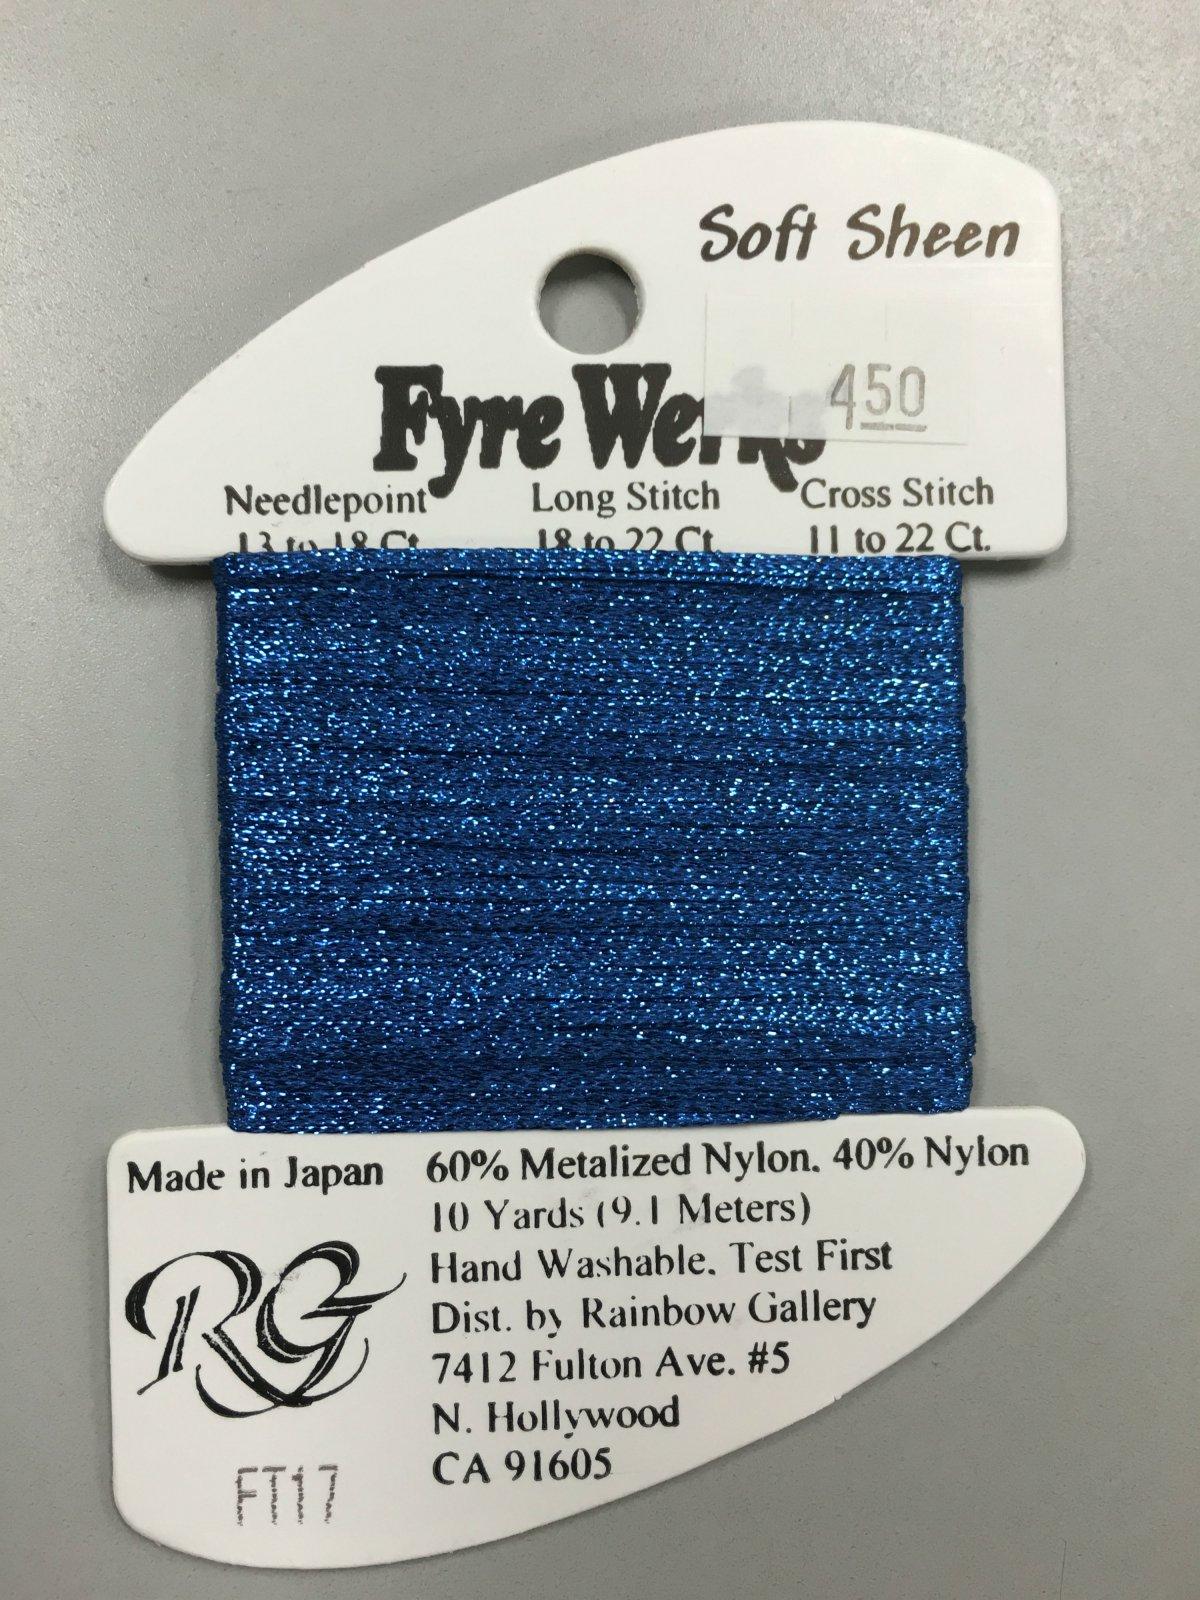 Fyre Werks Soft Sheen FT17